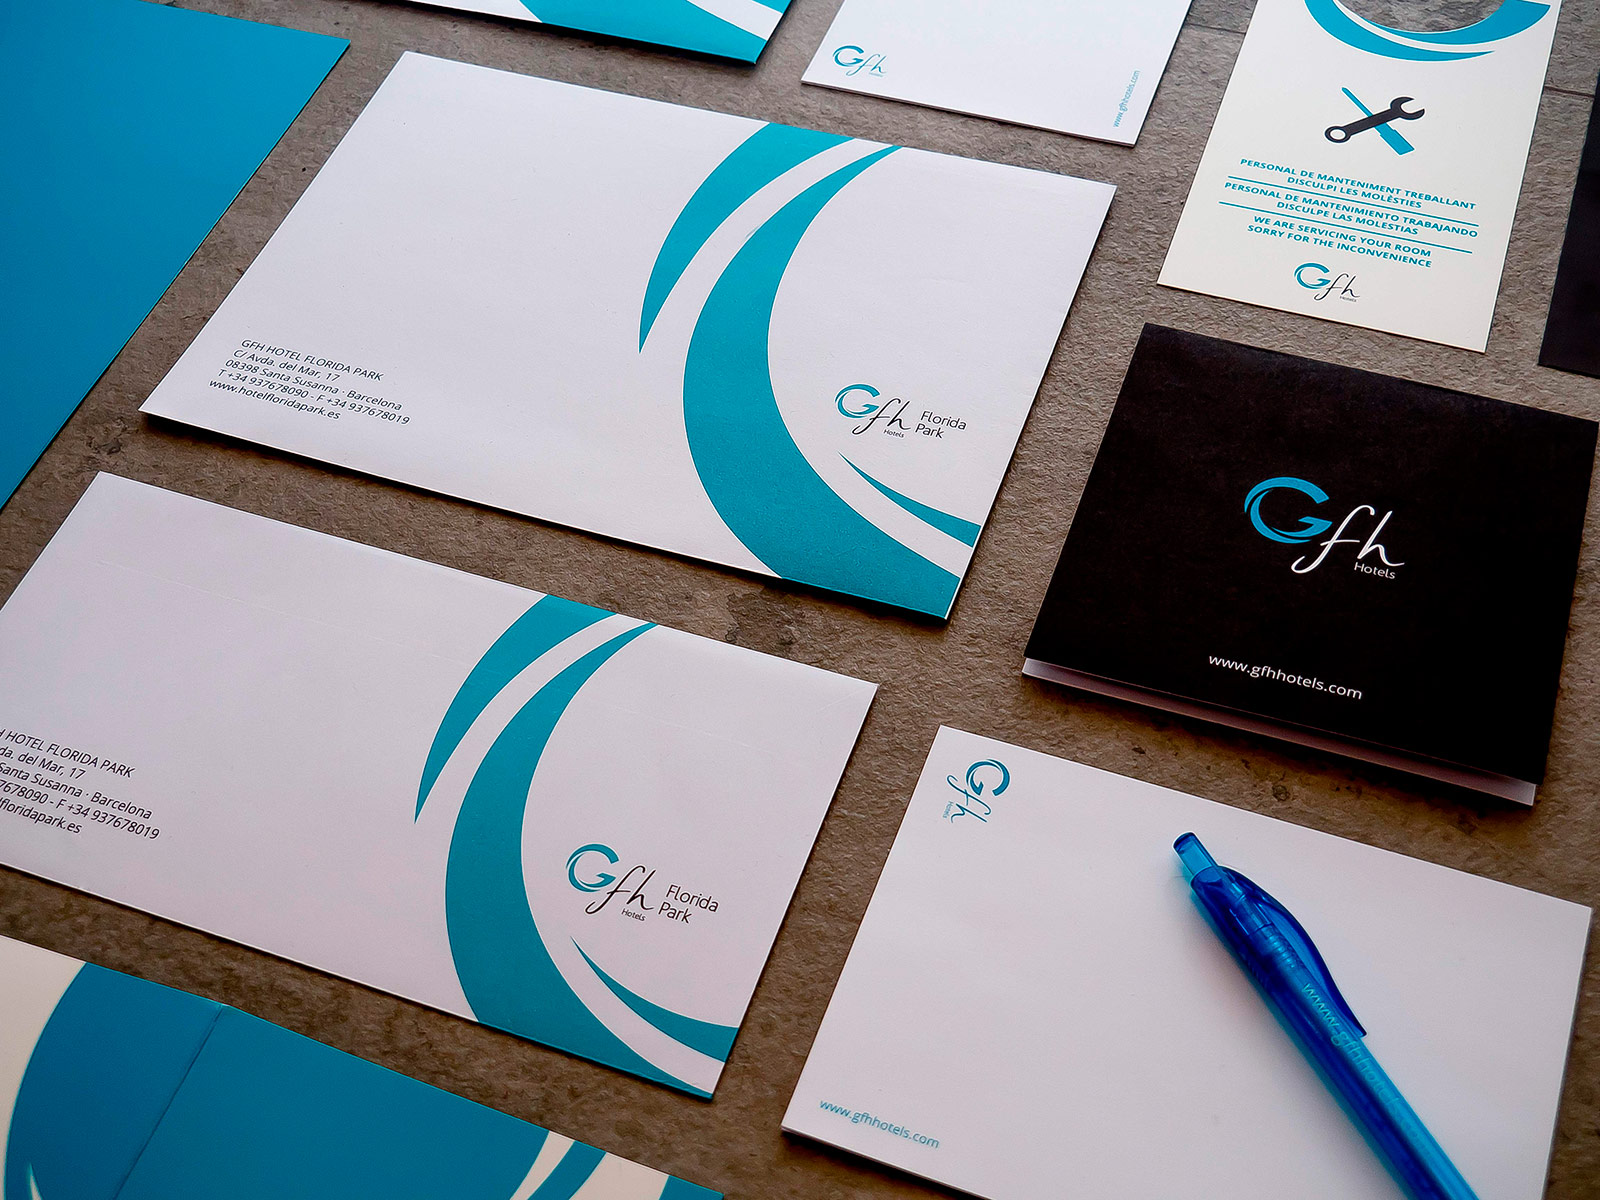 diseño grafico  Identidad corporativa     7